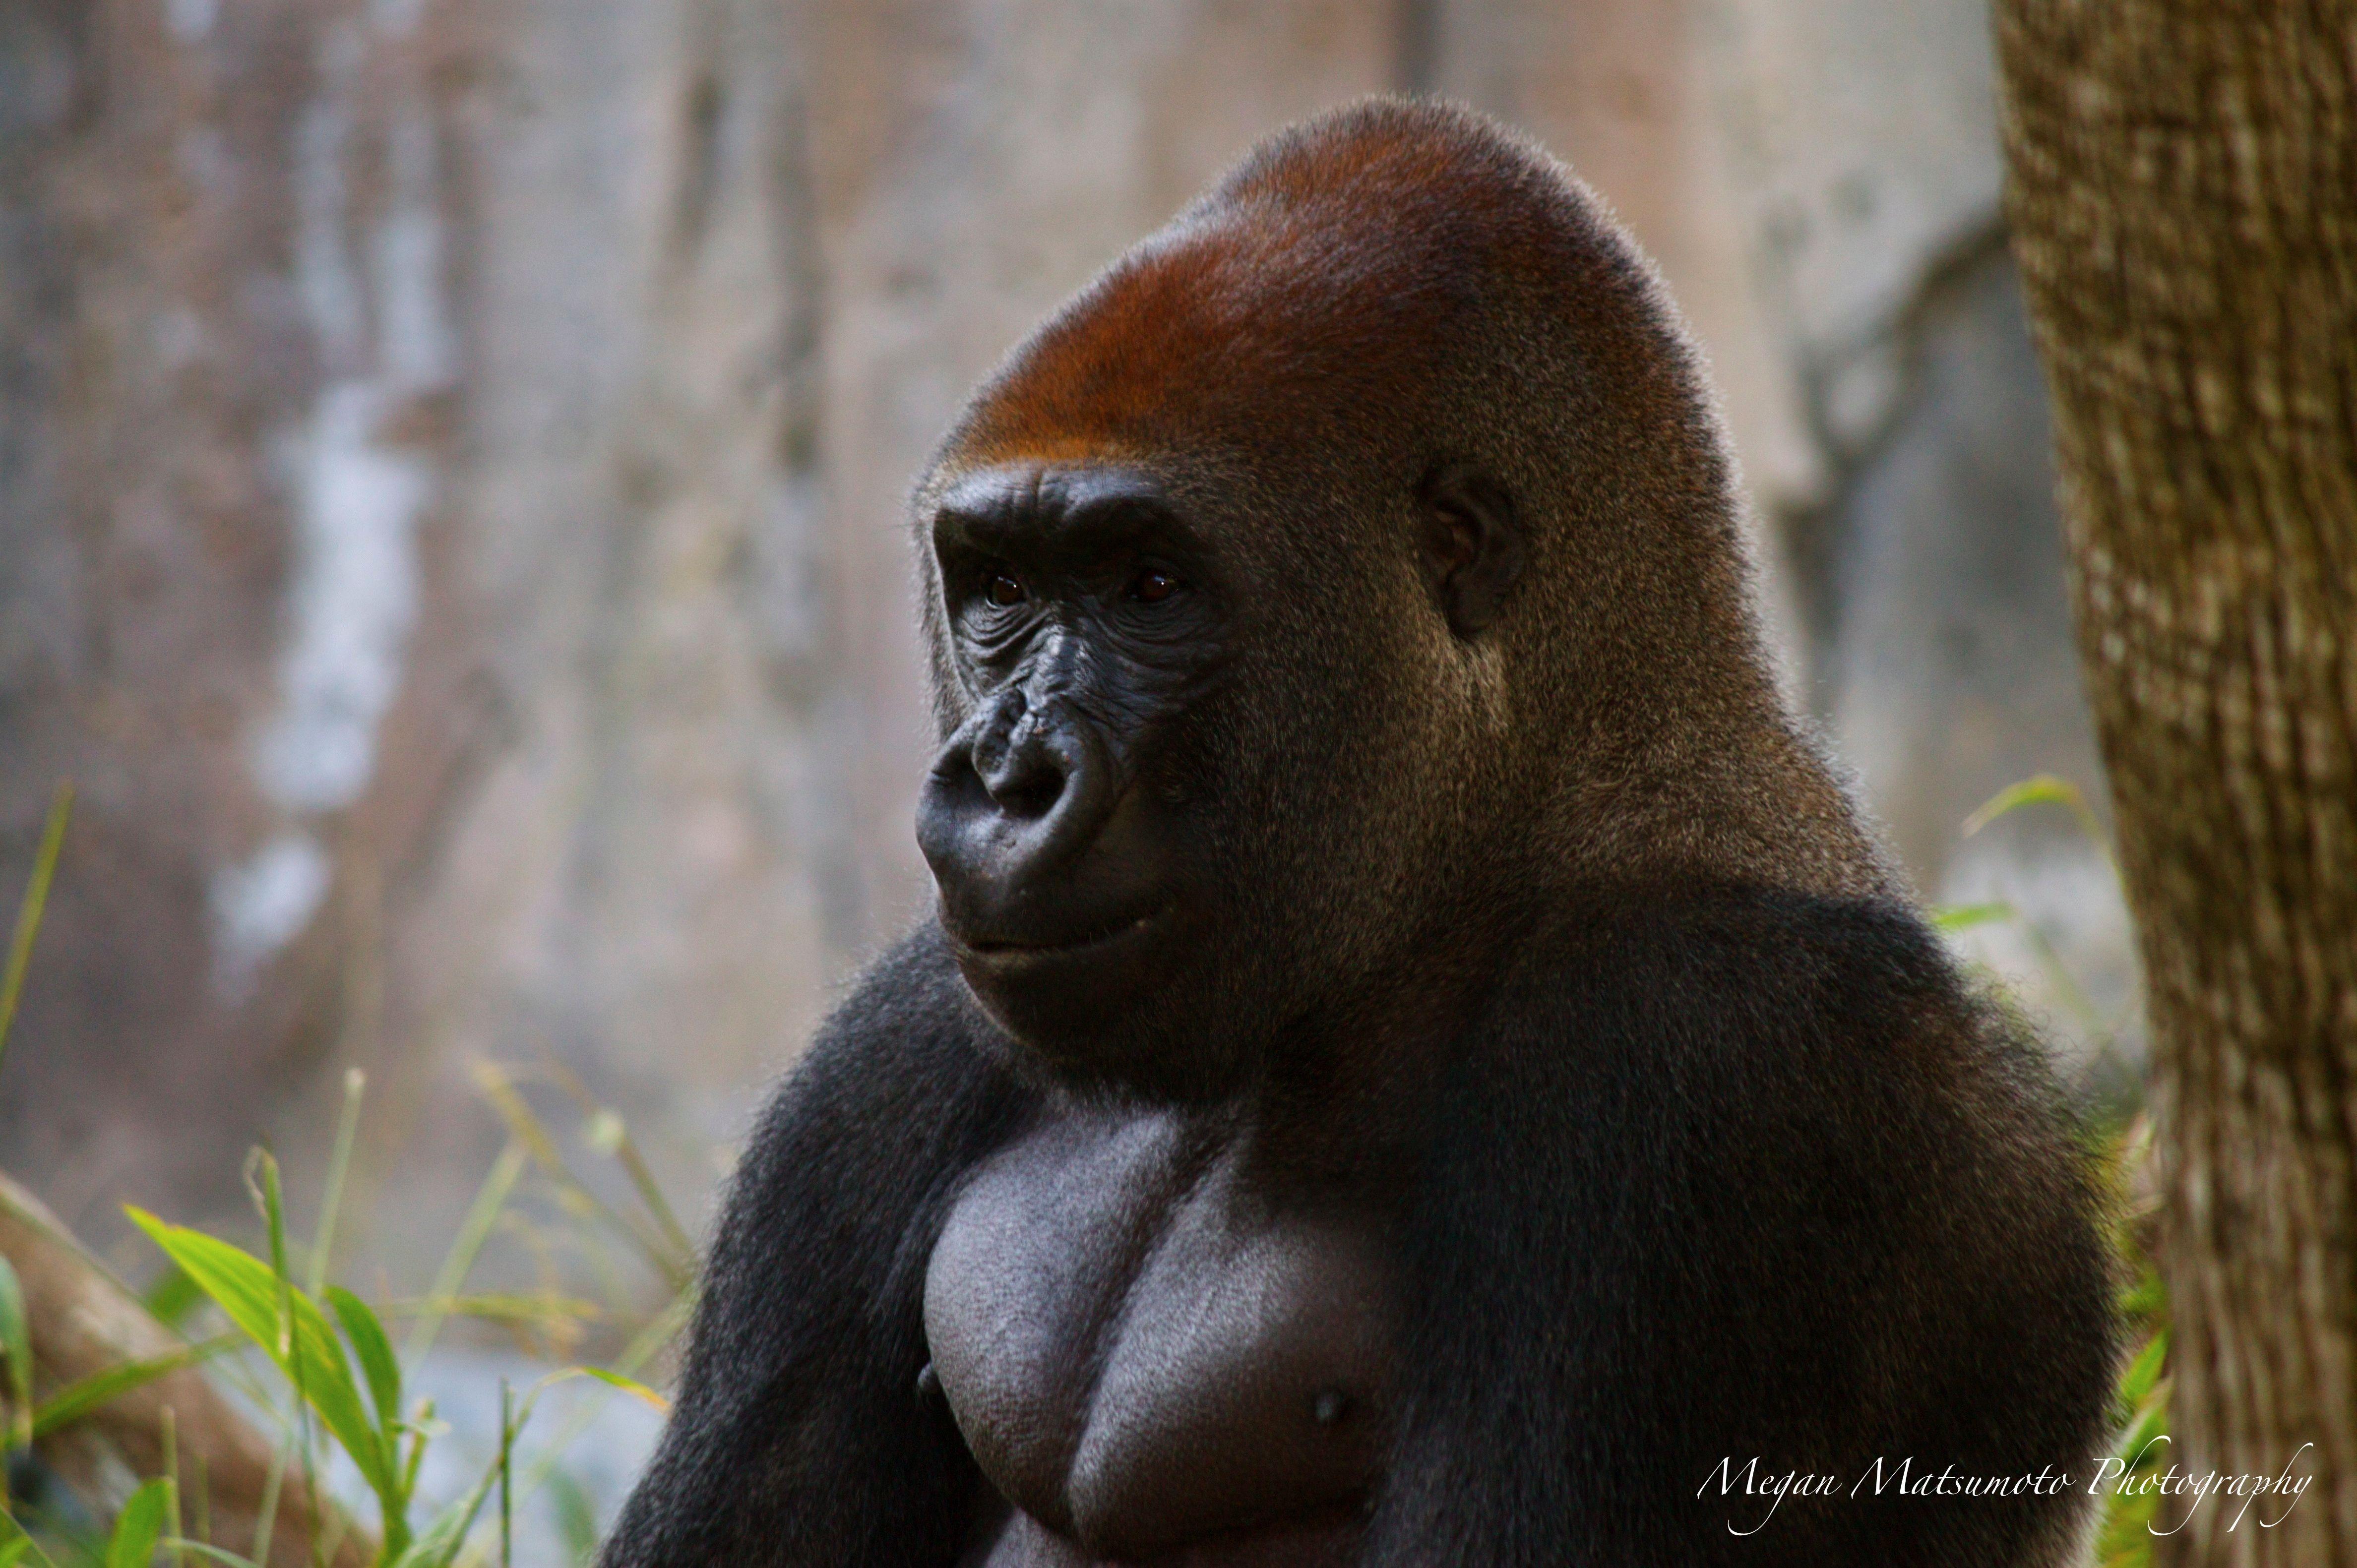 siberian tiger vs silverback gorilla wild animal fights